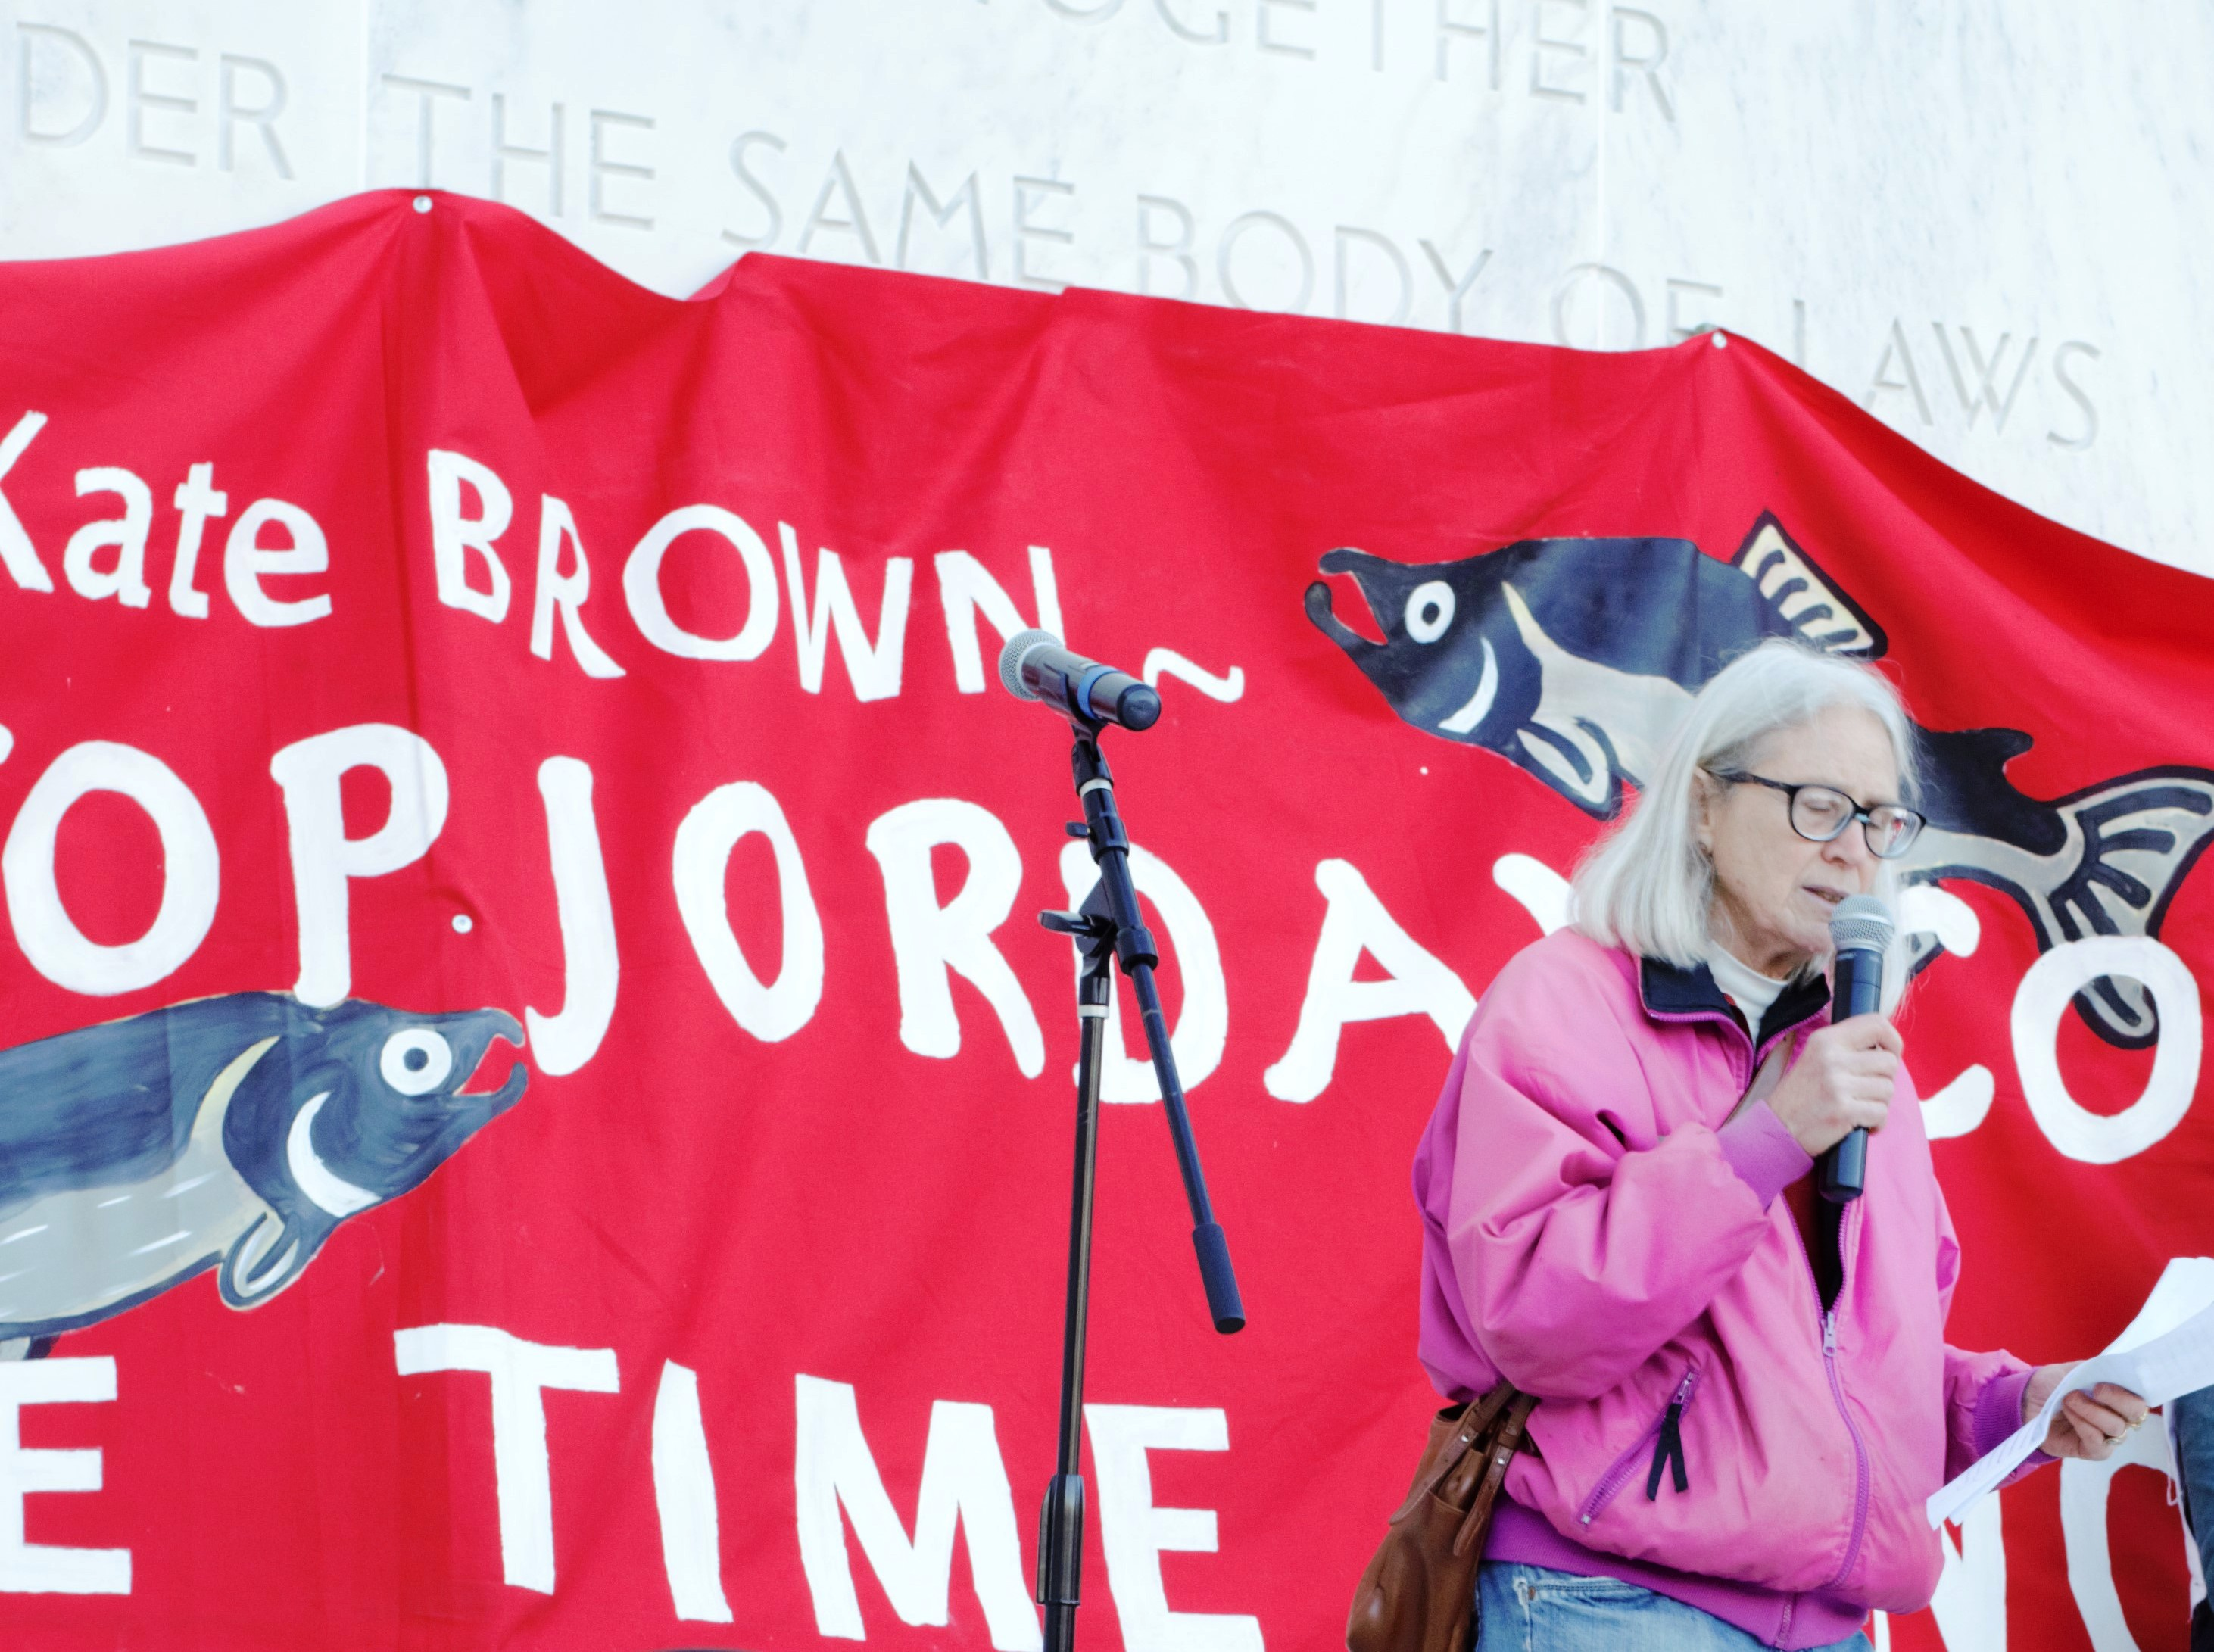 Patsy_Kullberg_speaking_at_Salem_capitol_against_Jordan_Cove_cropped.jpg